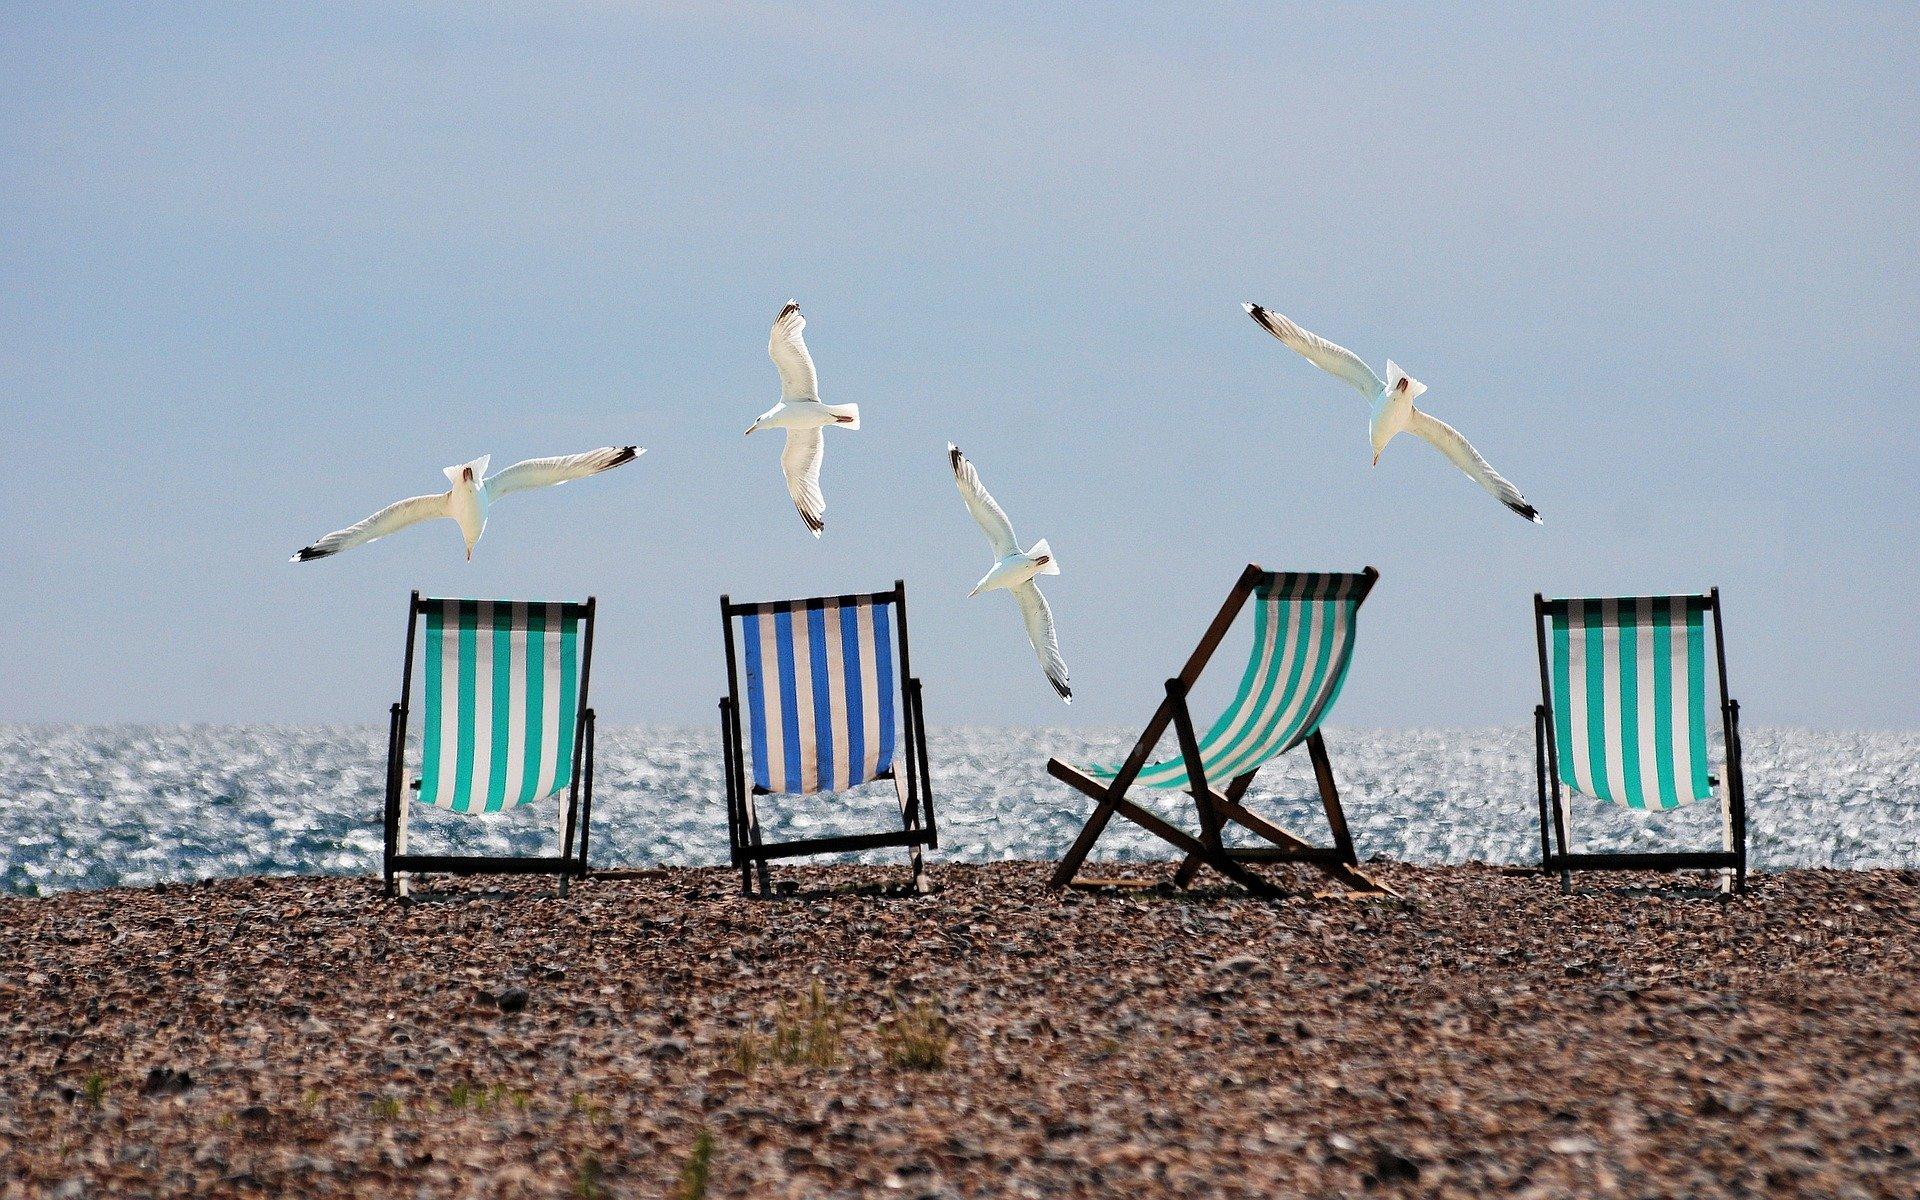 Deck chairs on beach